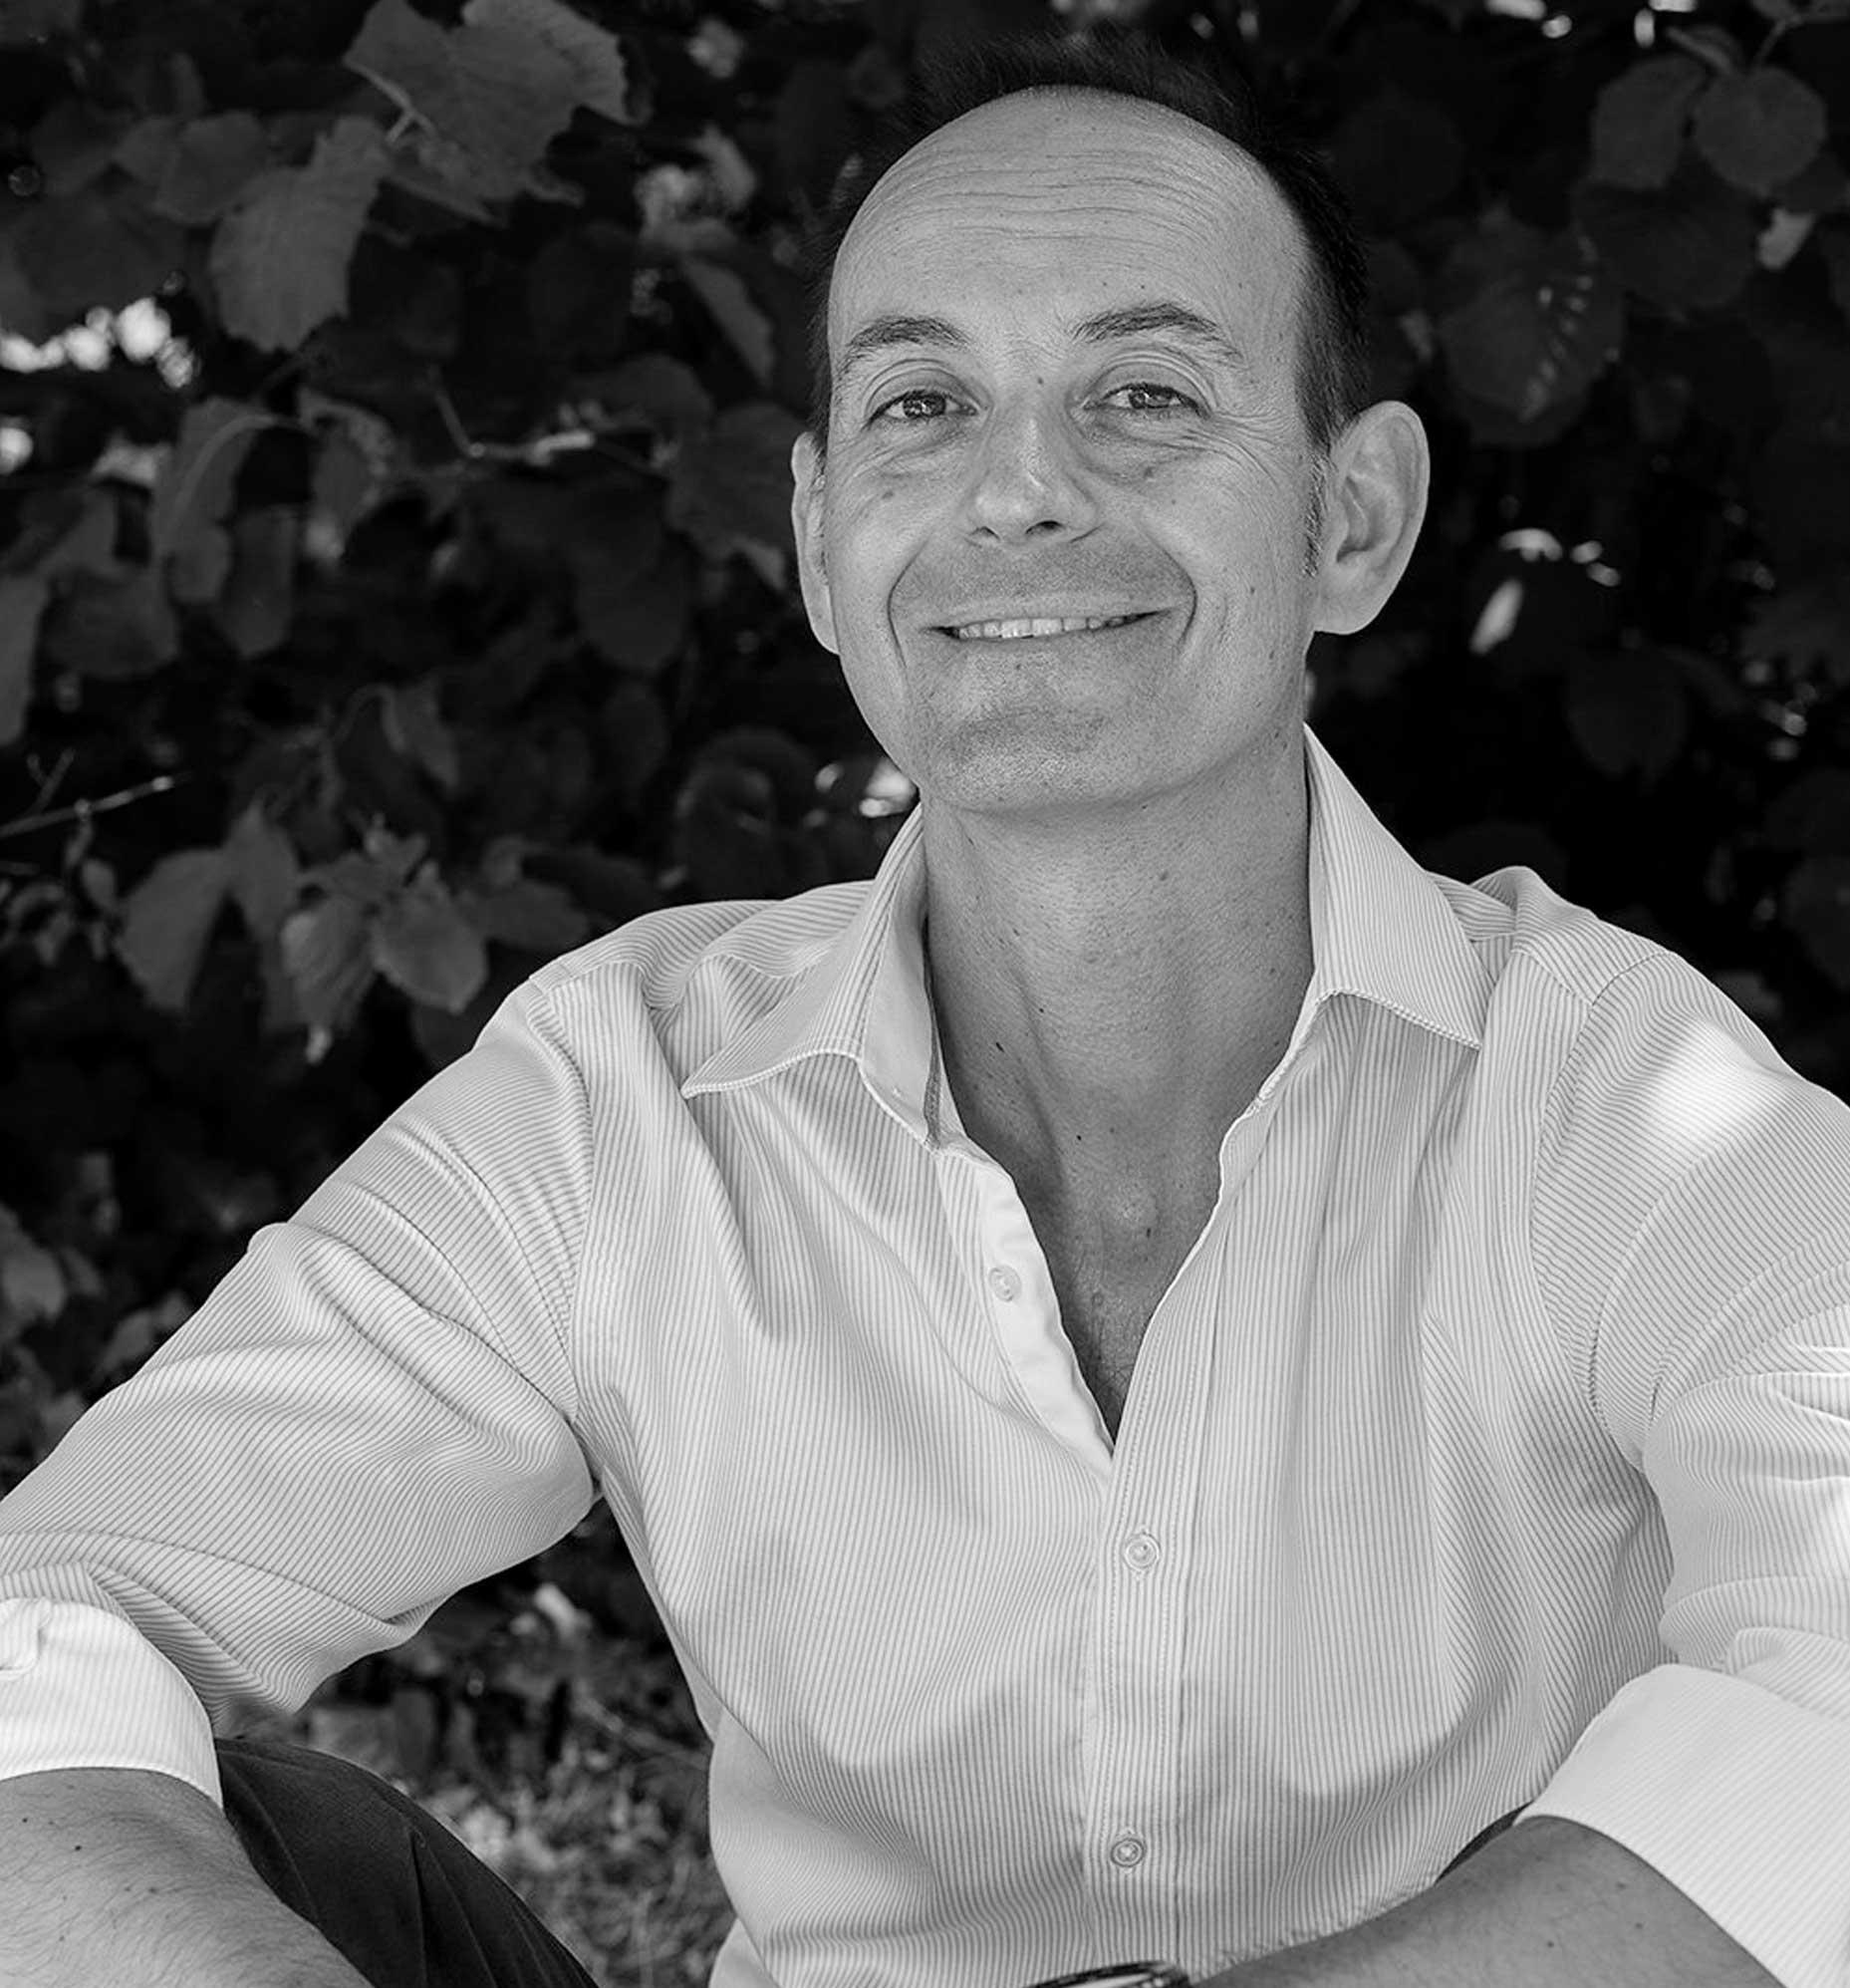 Pierre Bucchini